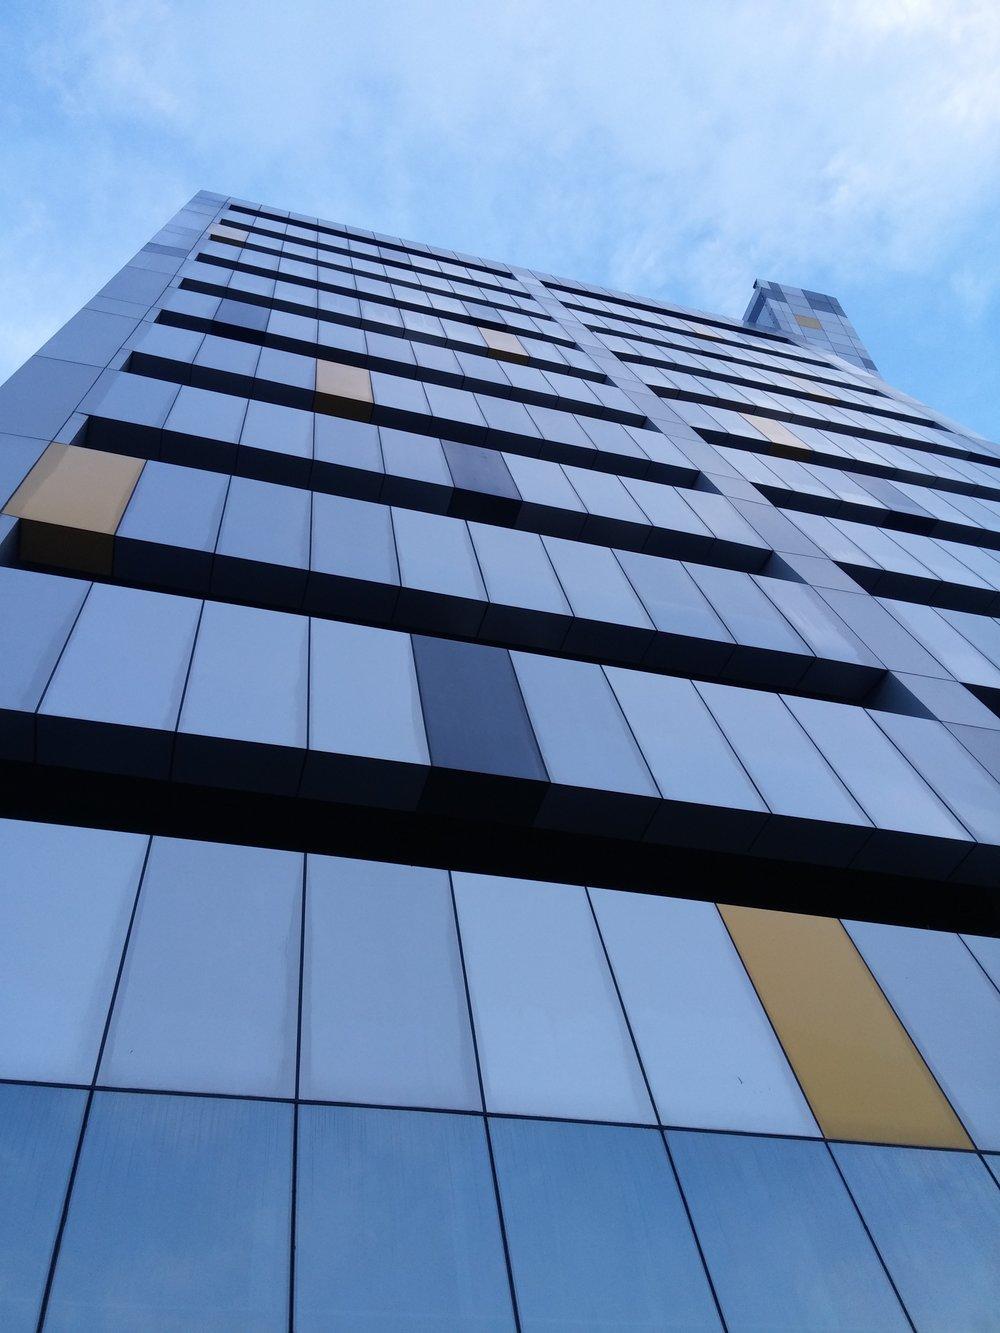 architectural-design-building-contemporary-345132.jpg